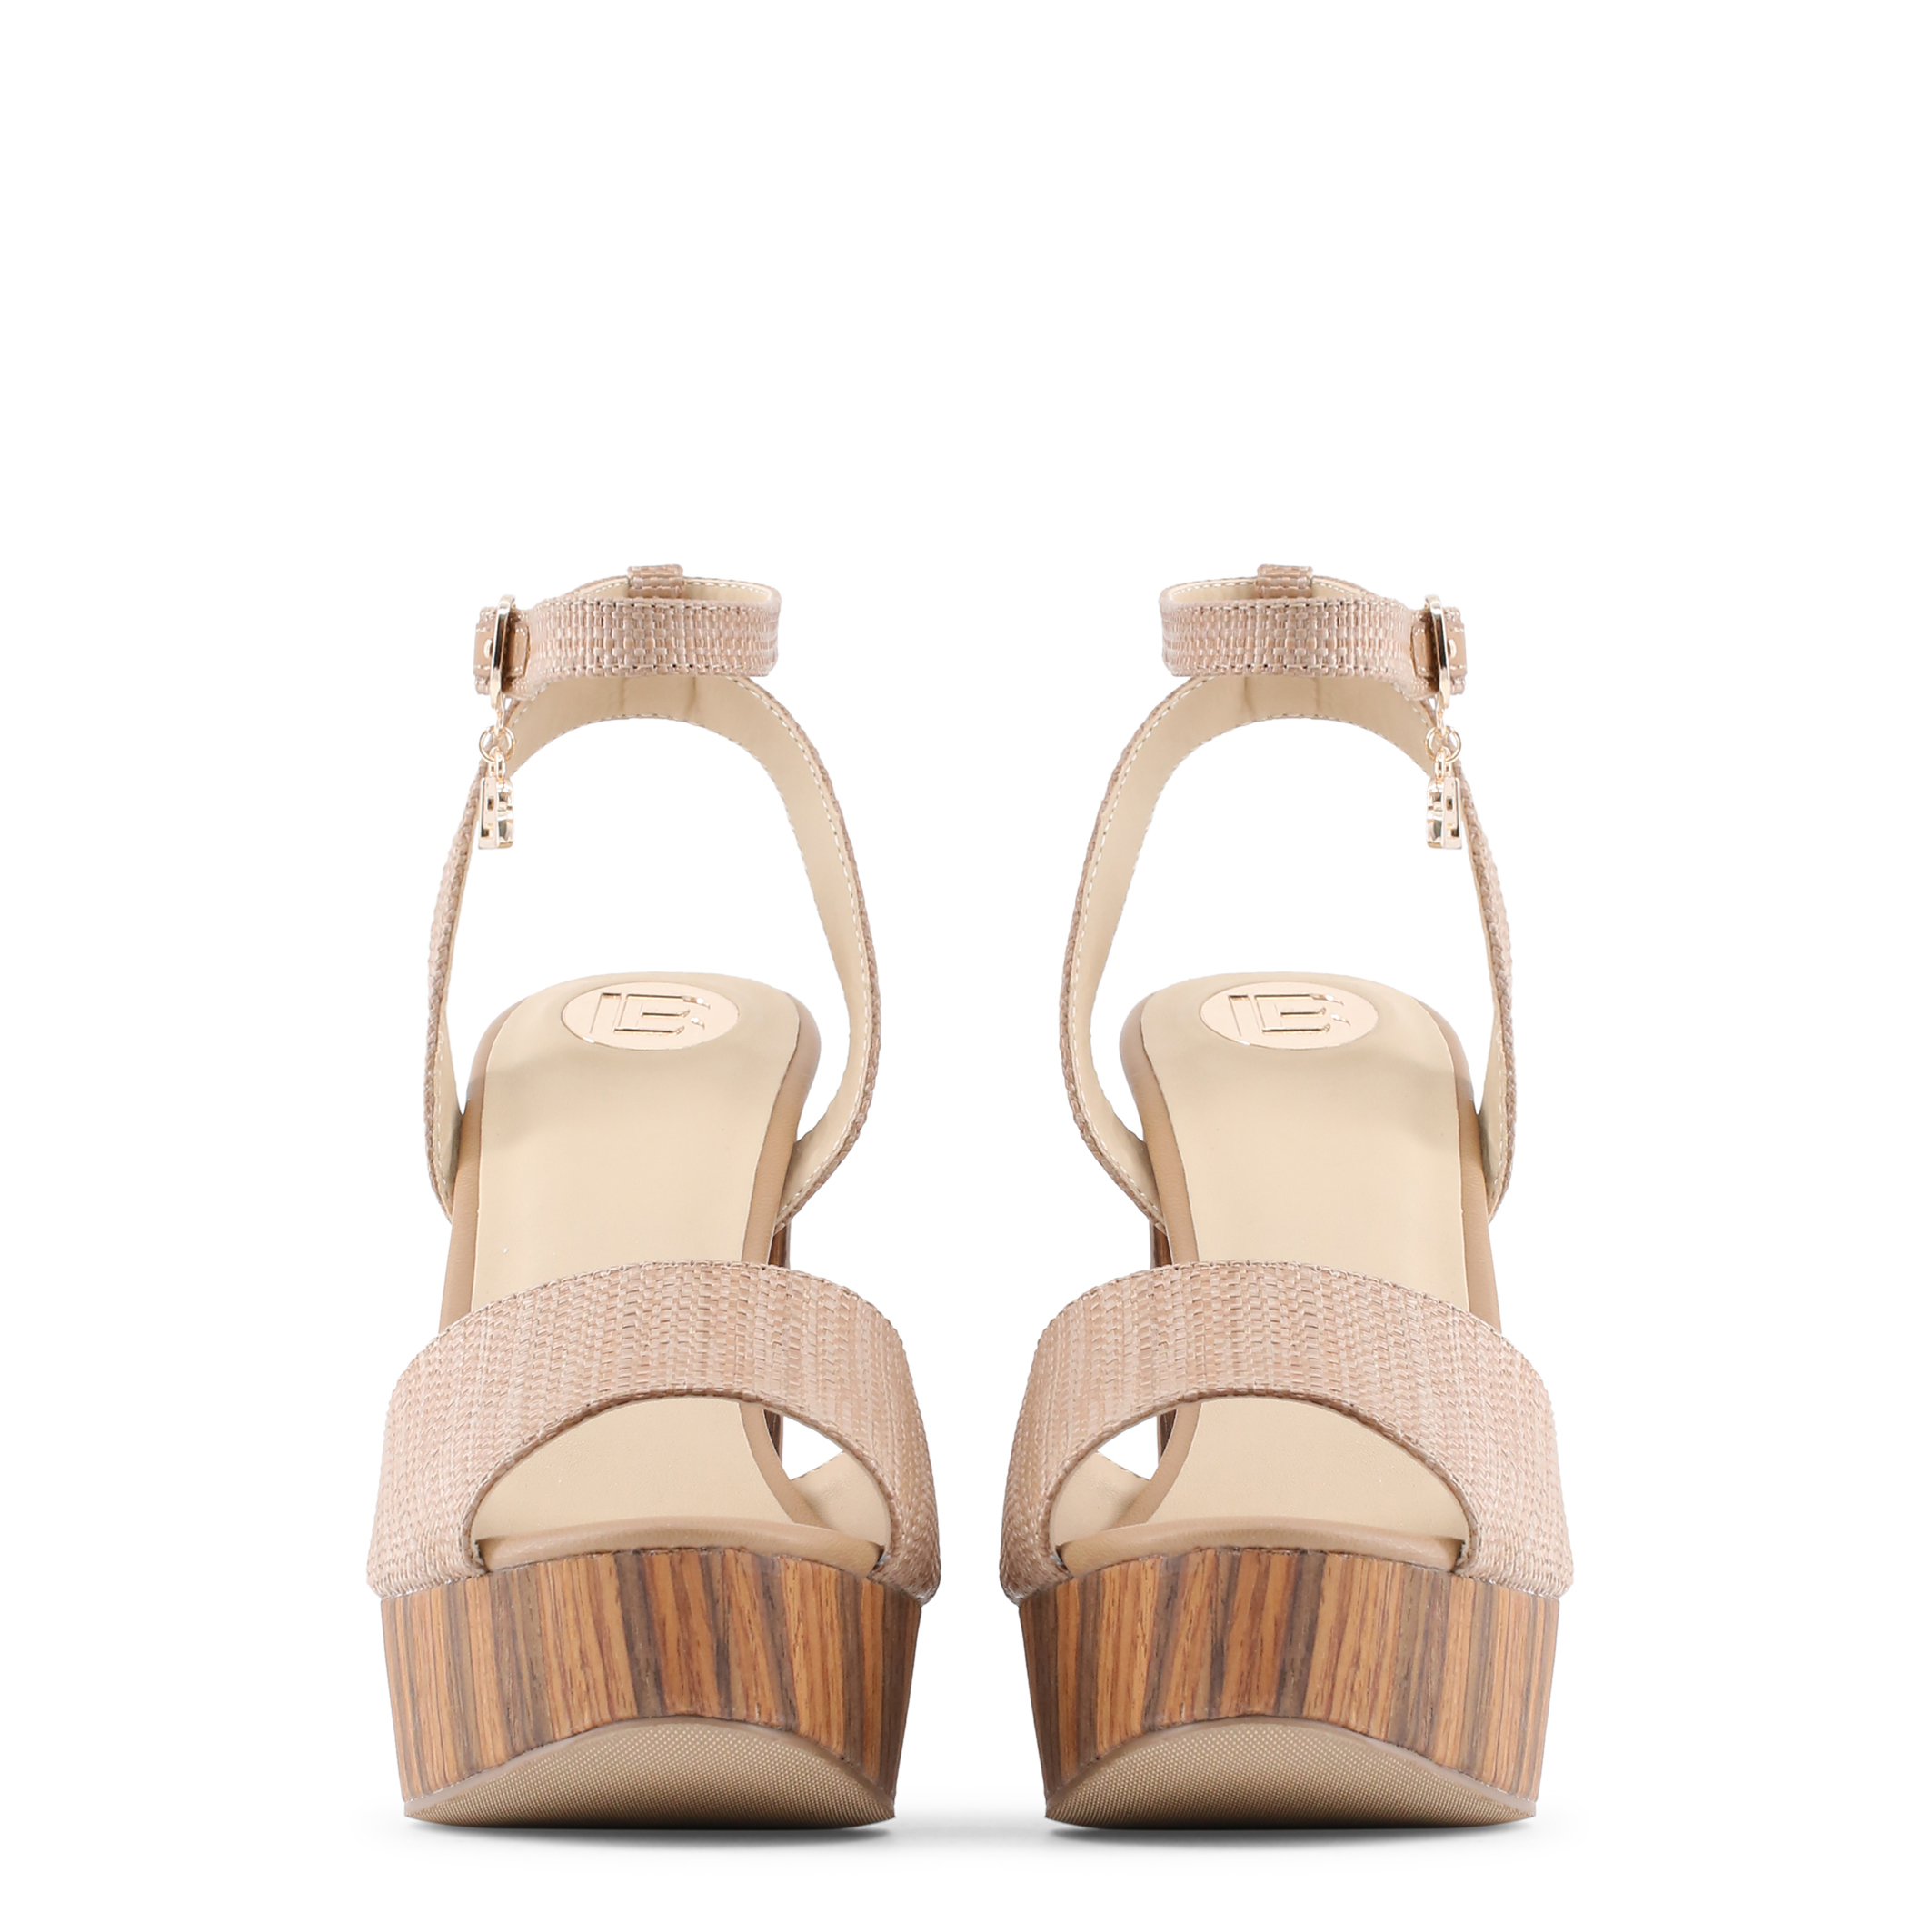 Chaussures  Laura Biagiotti 662_RAFIA brown